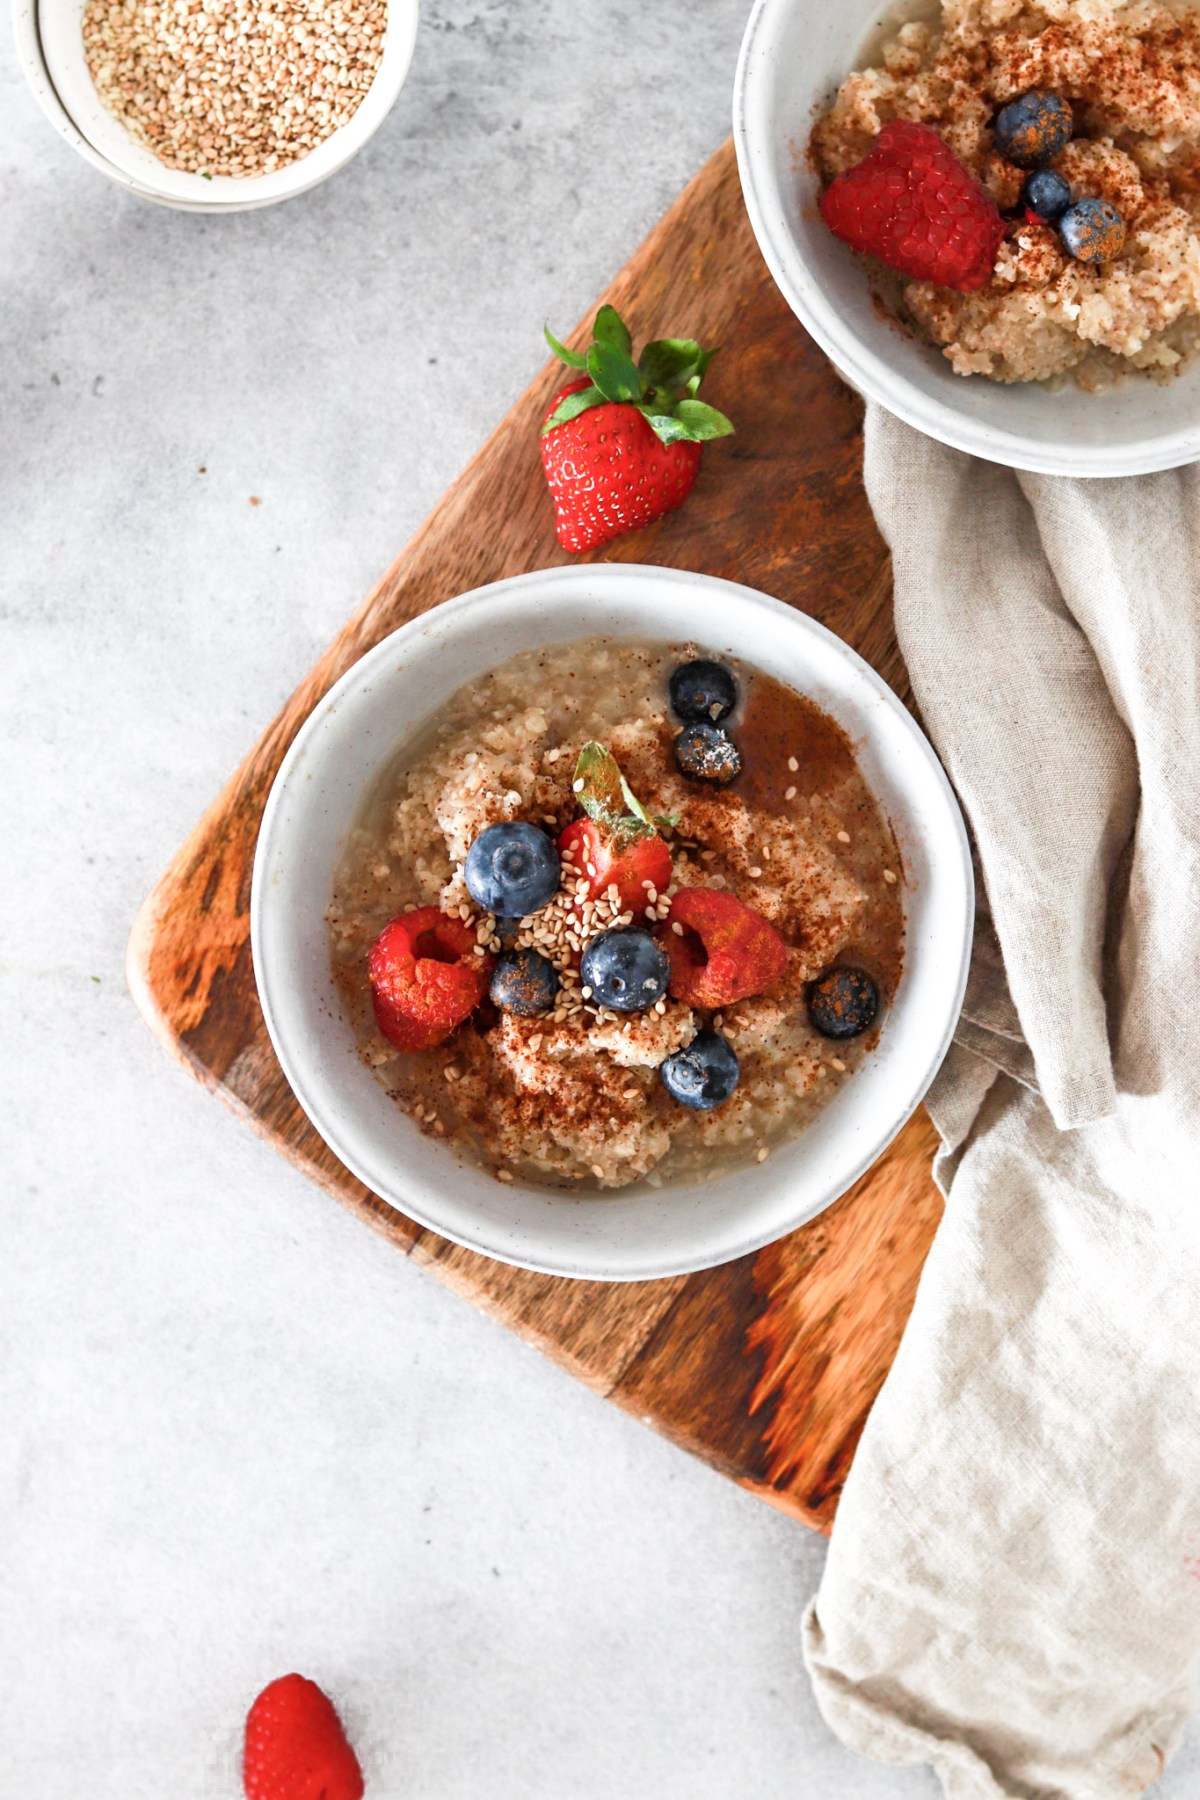 Vanilla Cauliflower Porridge (Vegan, Gluten, Grain, Sugar Free & Low Carb) From Above